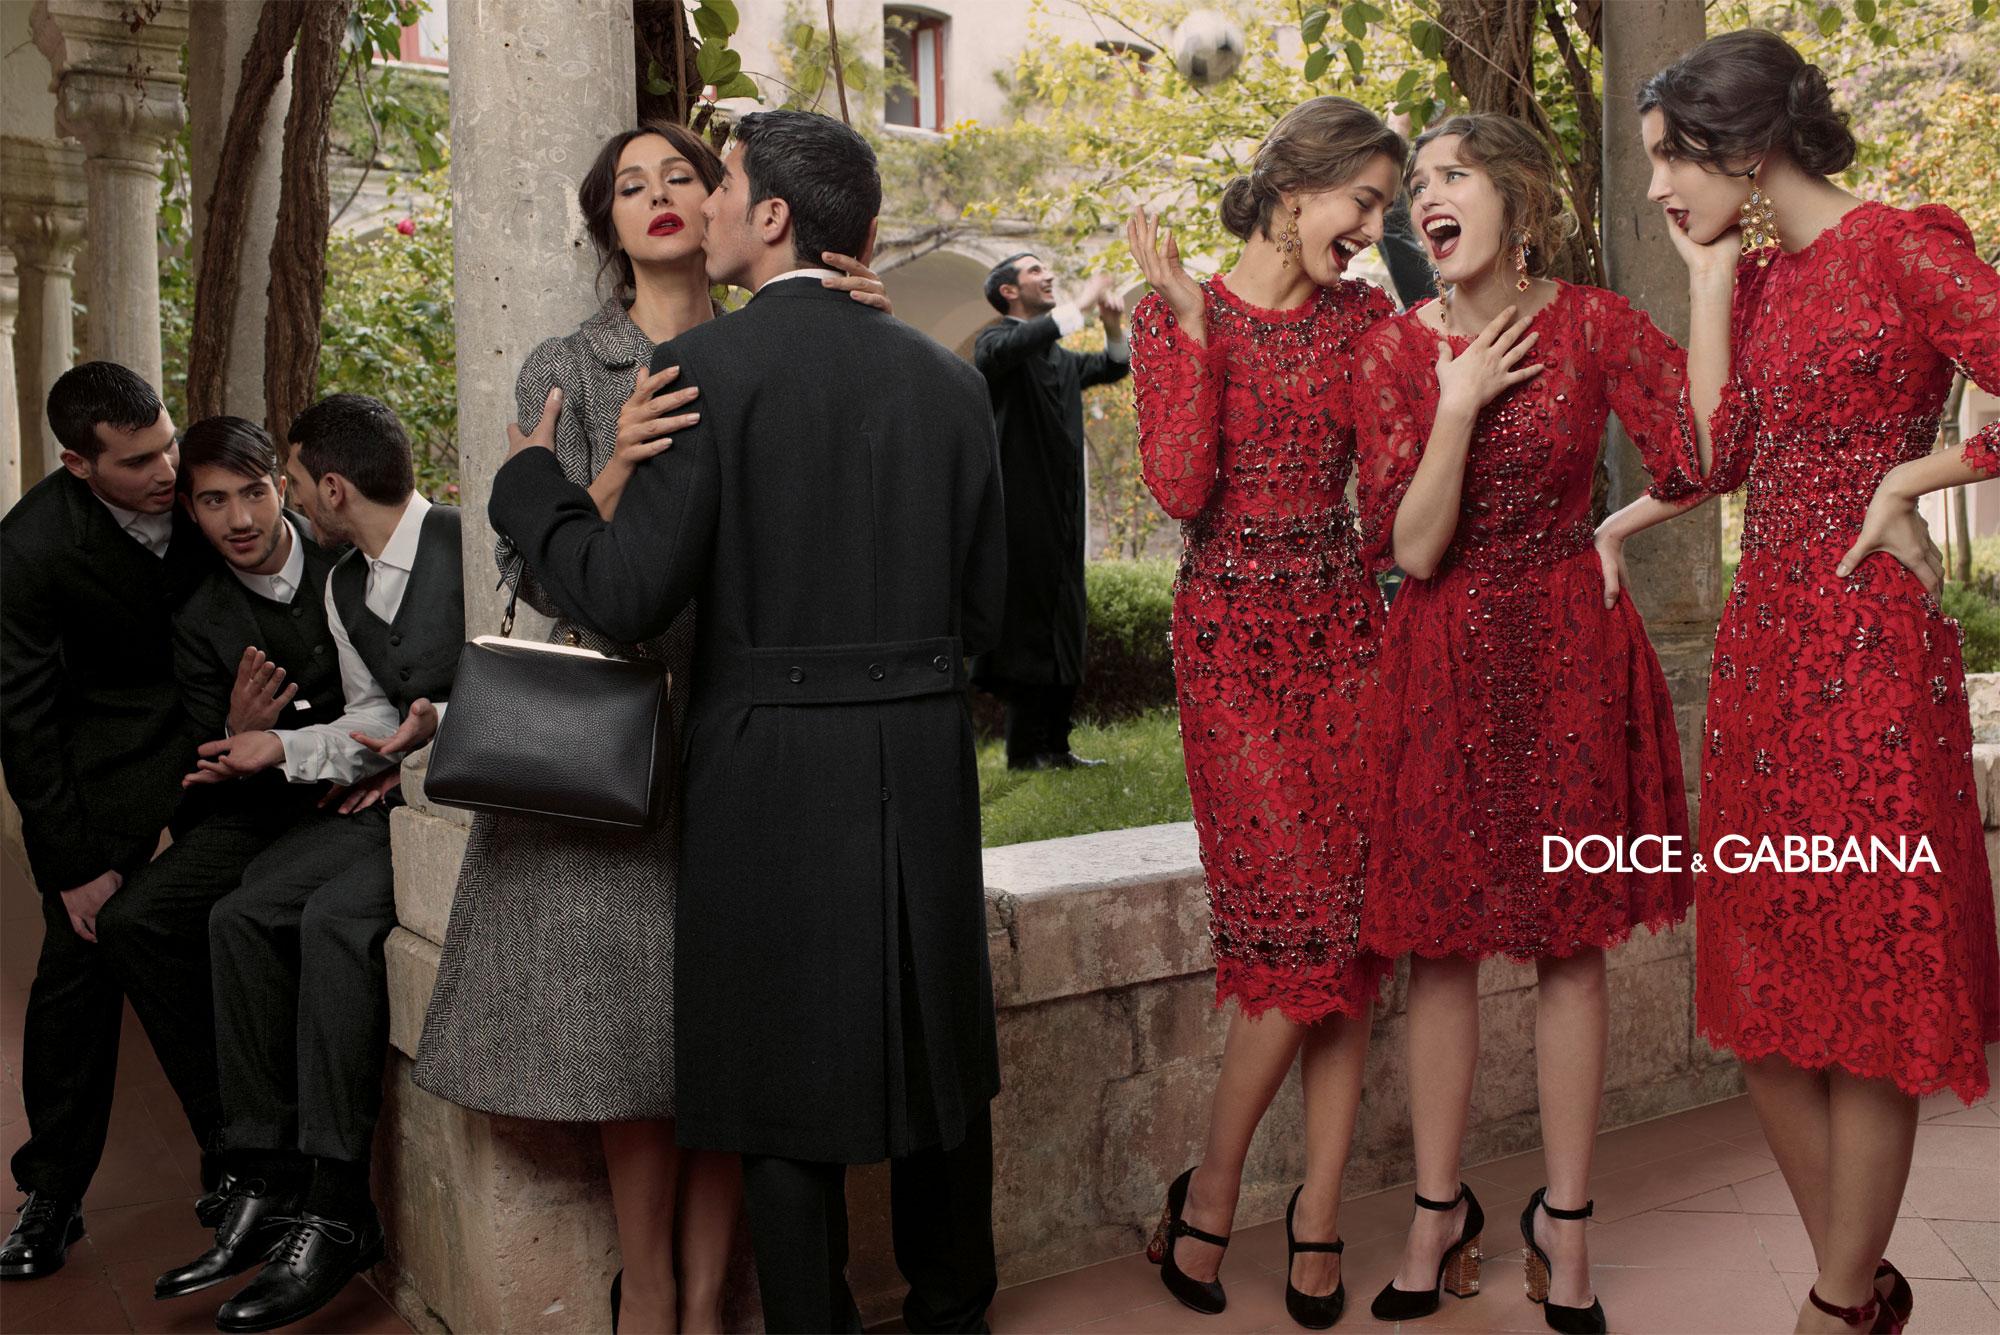 dolce-and-gabbana-fw-2014-women-adv-campaign-6